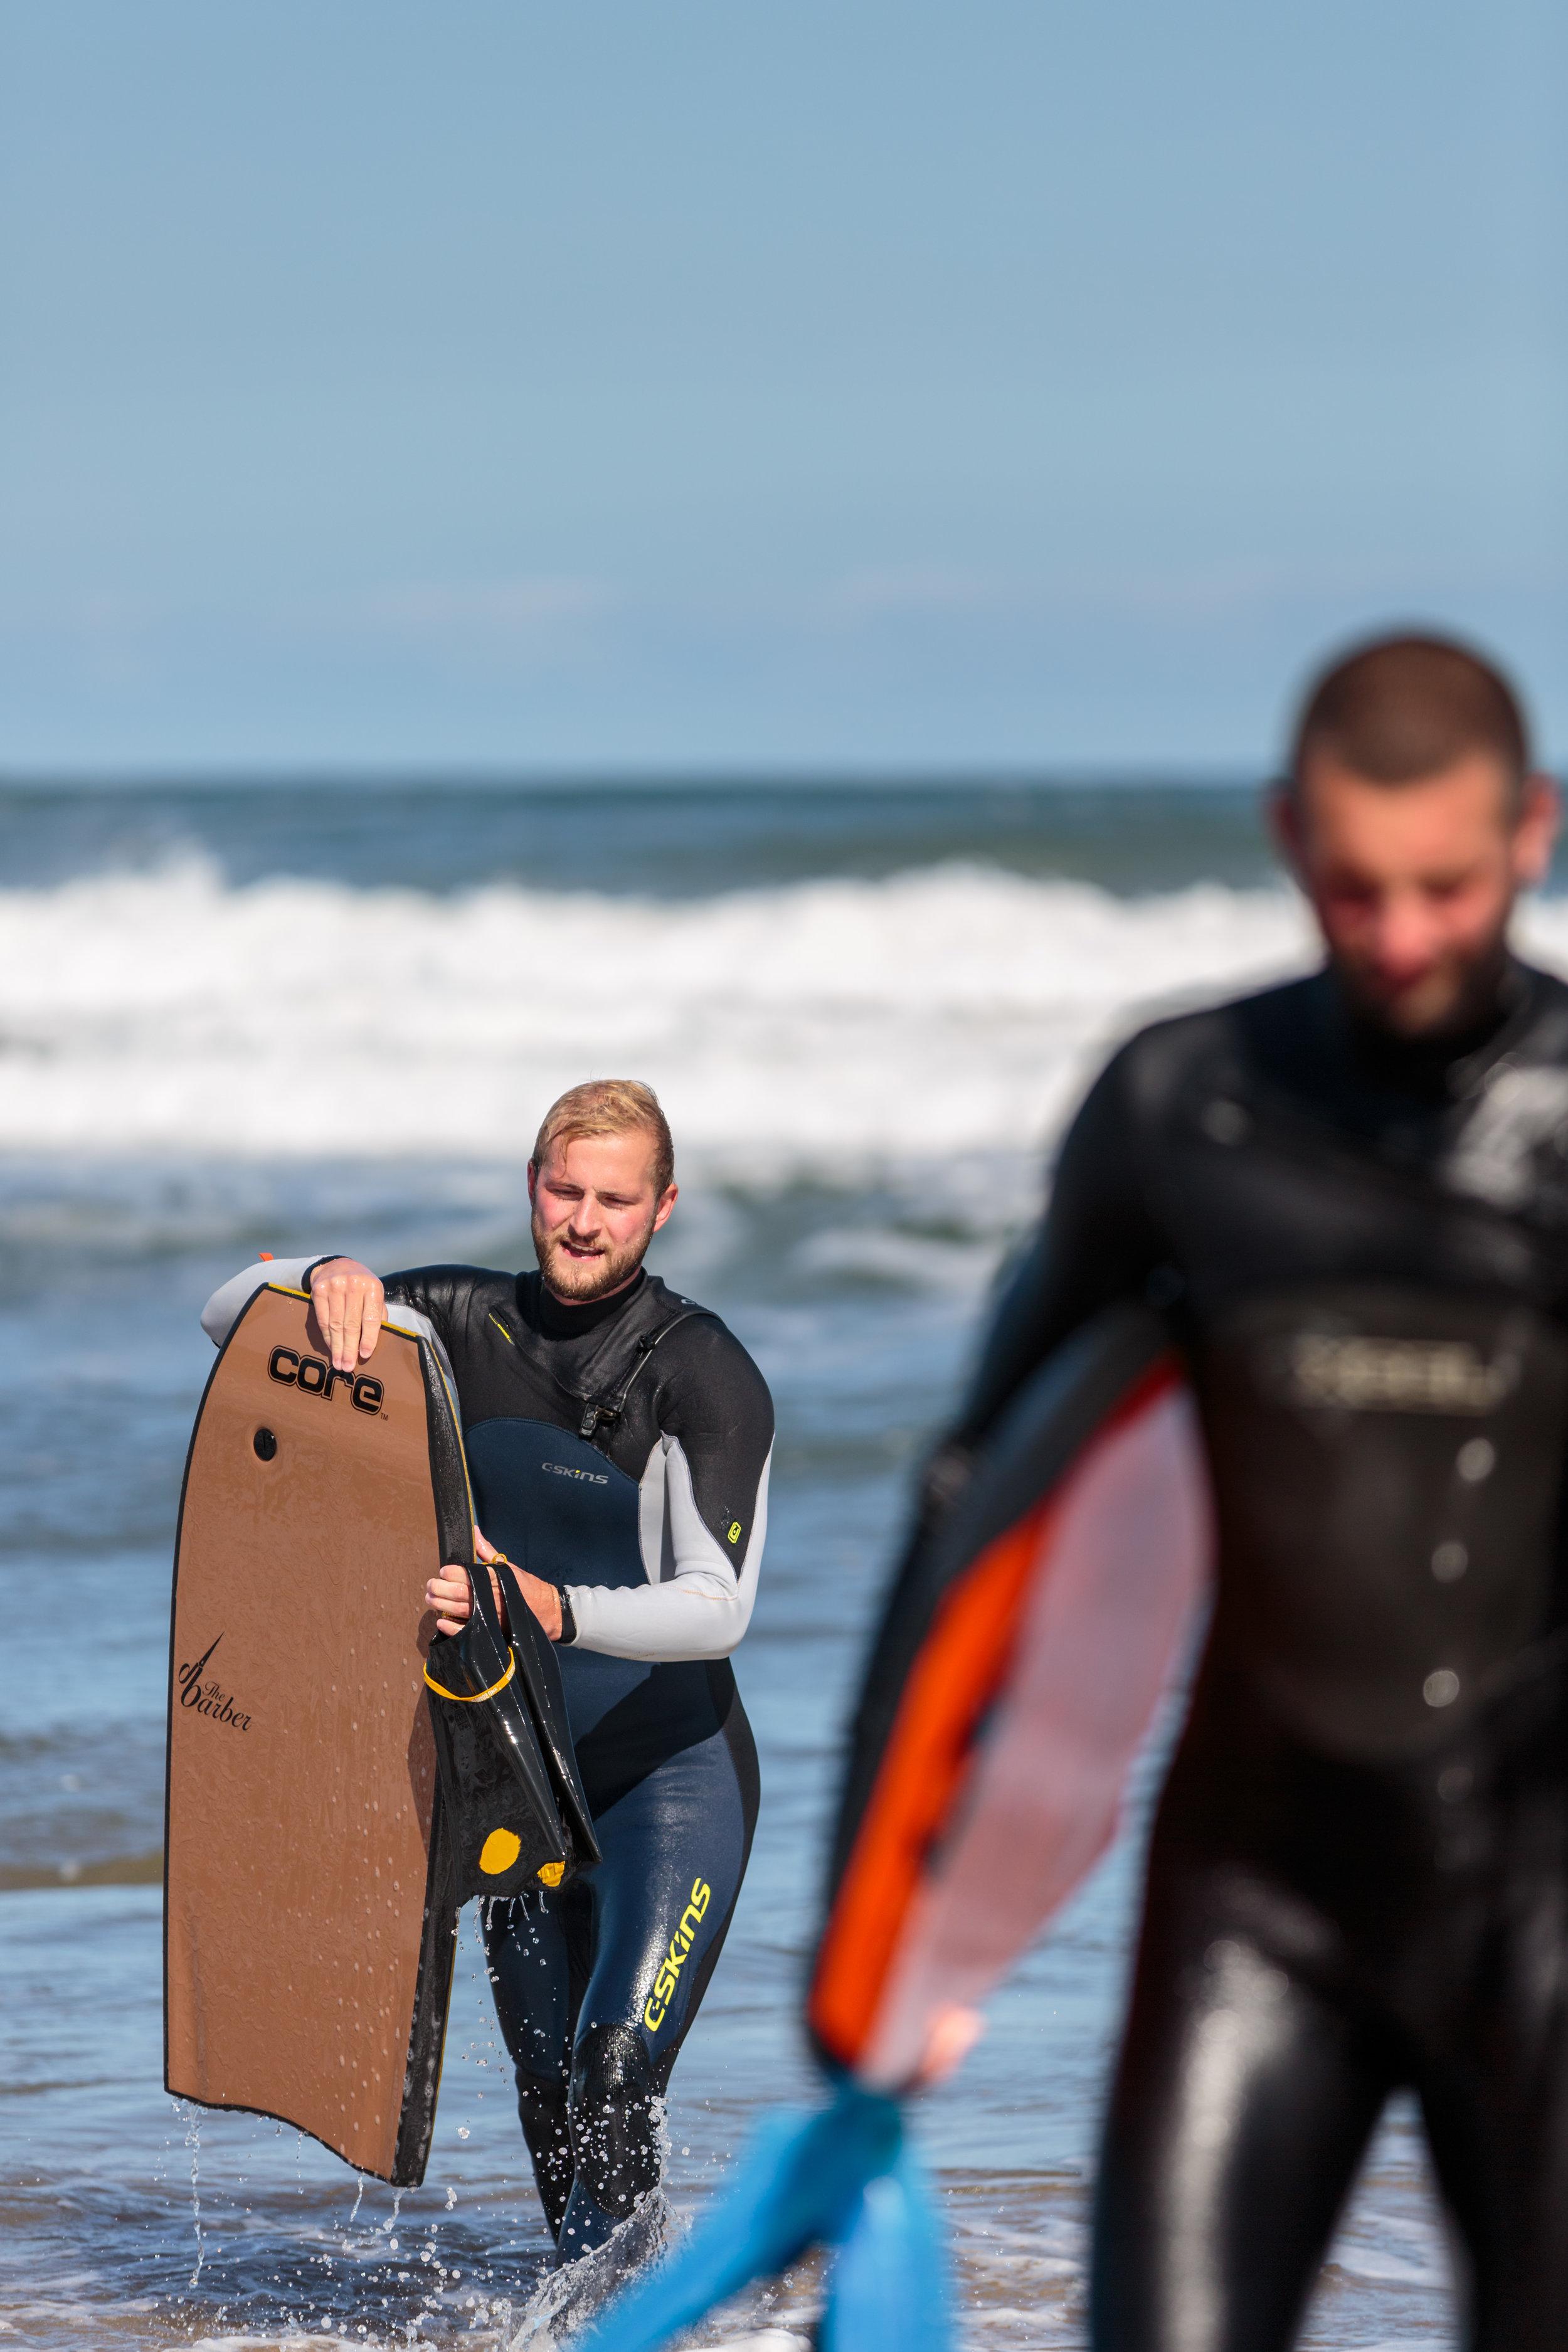 Bodyboarders exiting the ocean